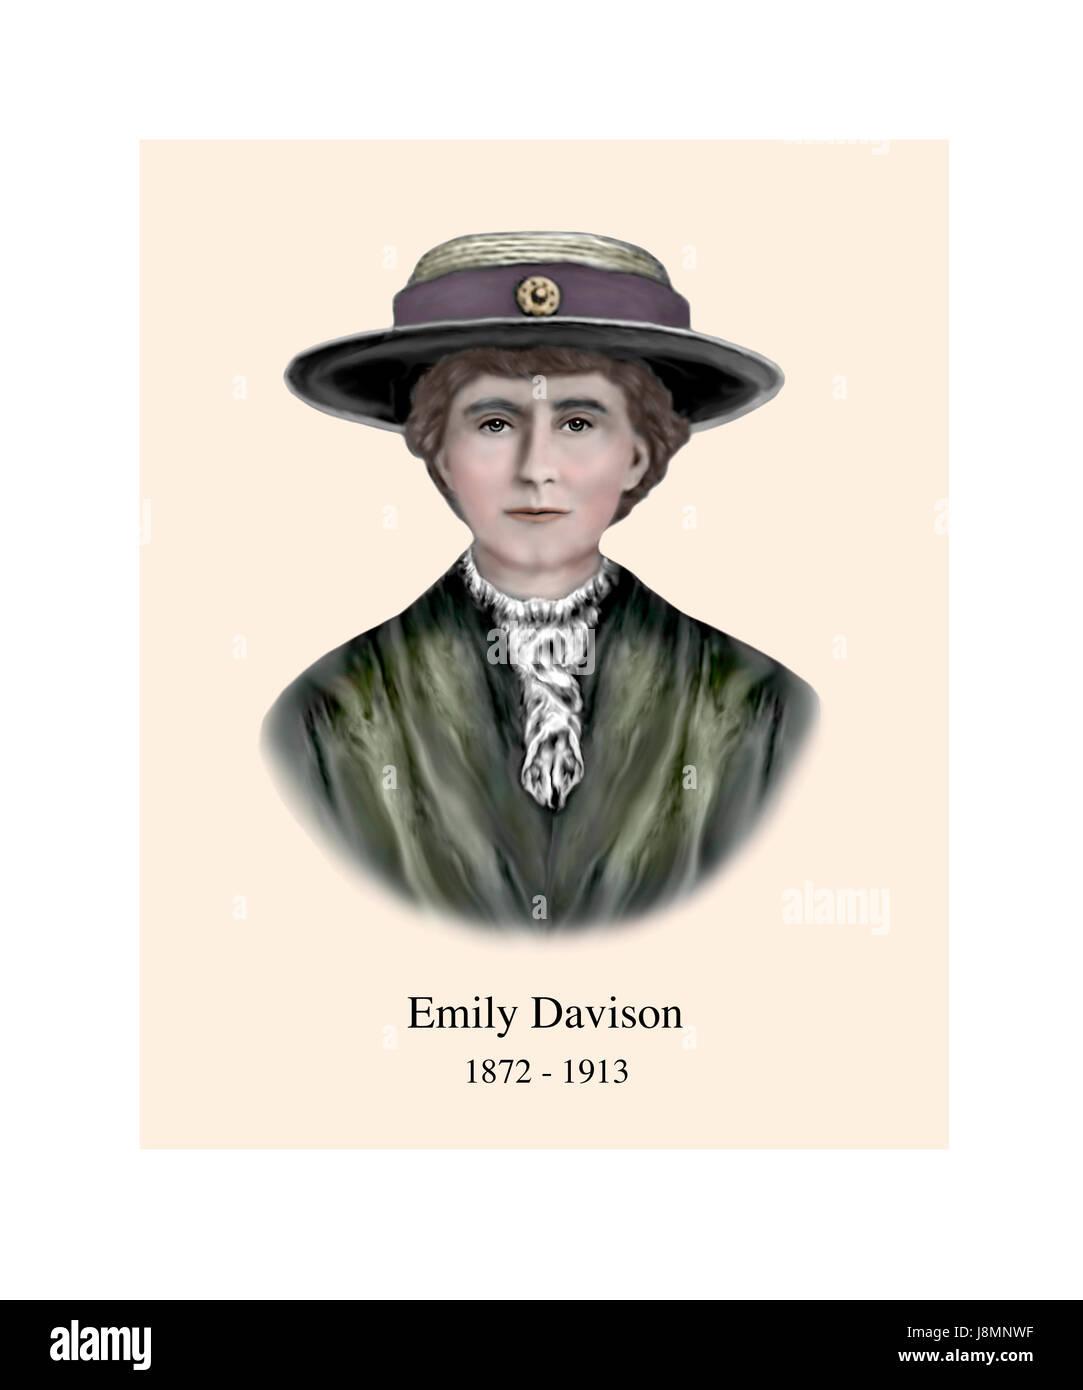 Emily Davison, 1872 - 1913, English Suffragette - Stock Image